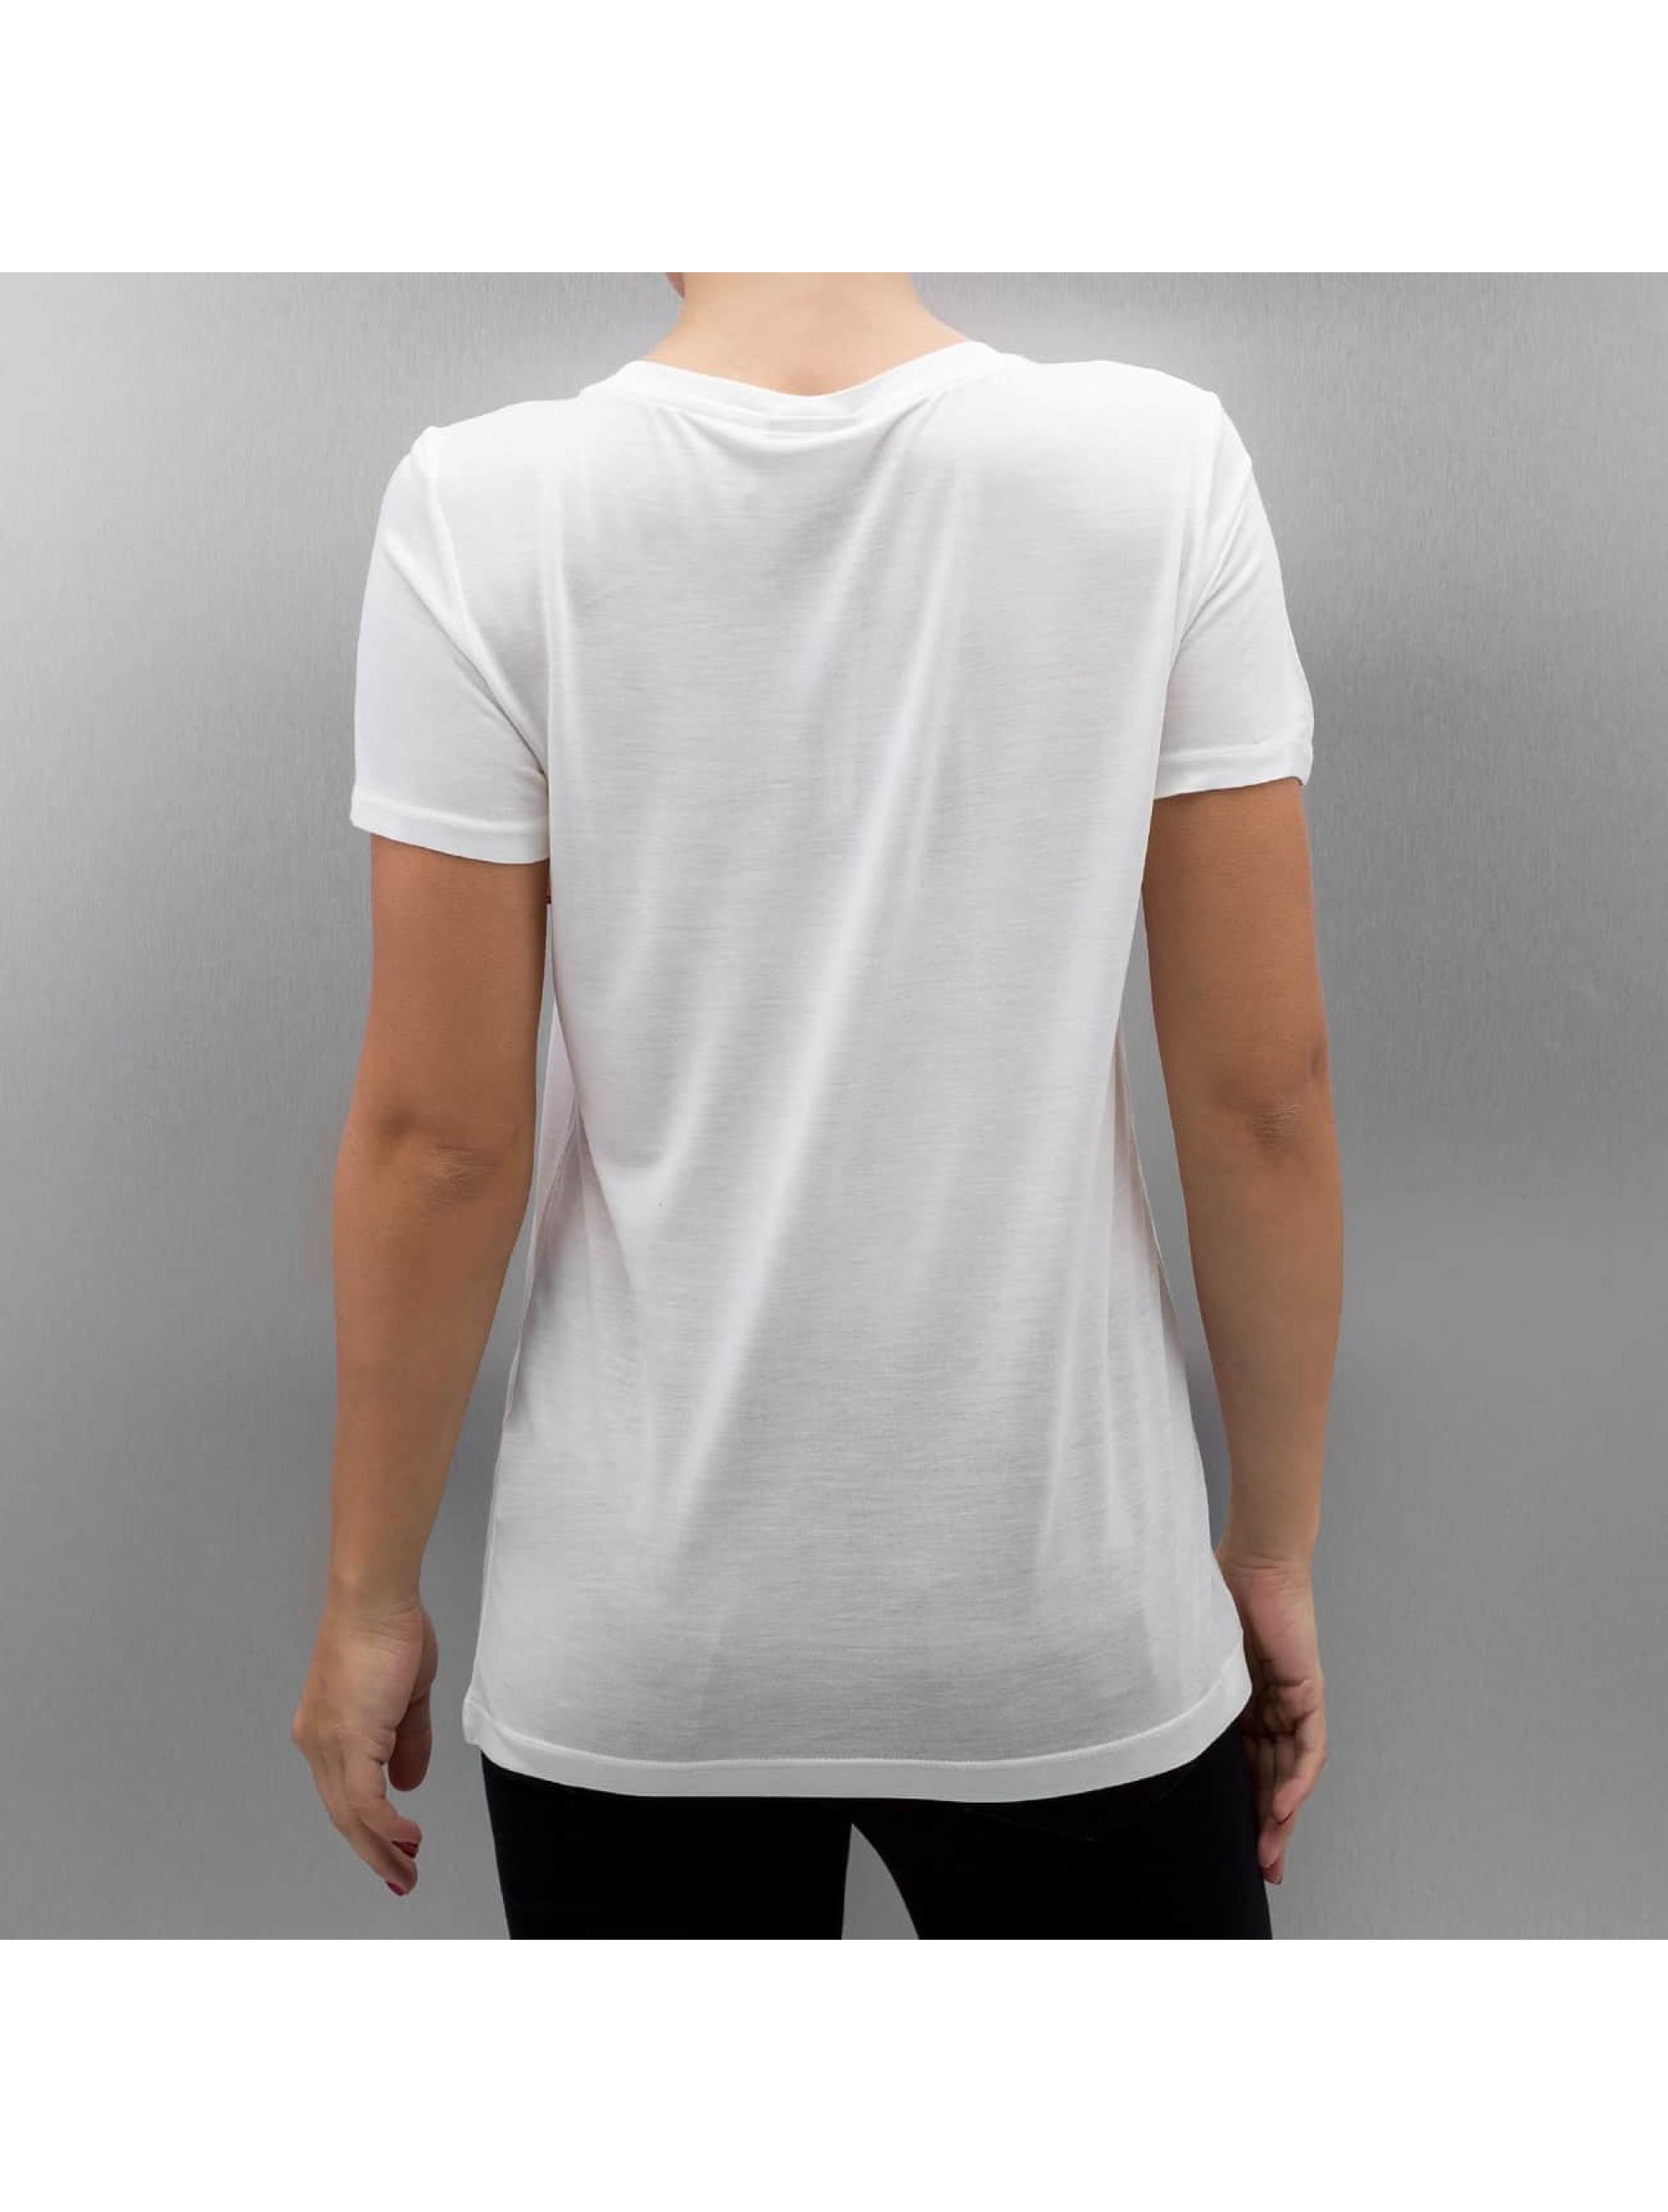 Vero Moda Camiseta VmChristmas Sequin blanco